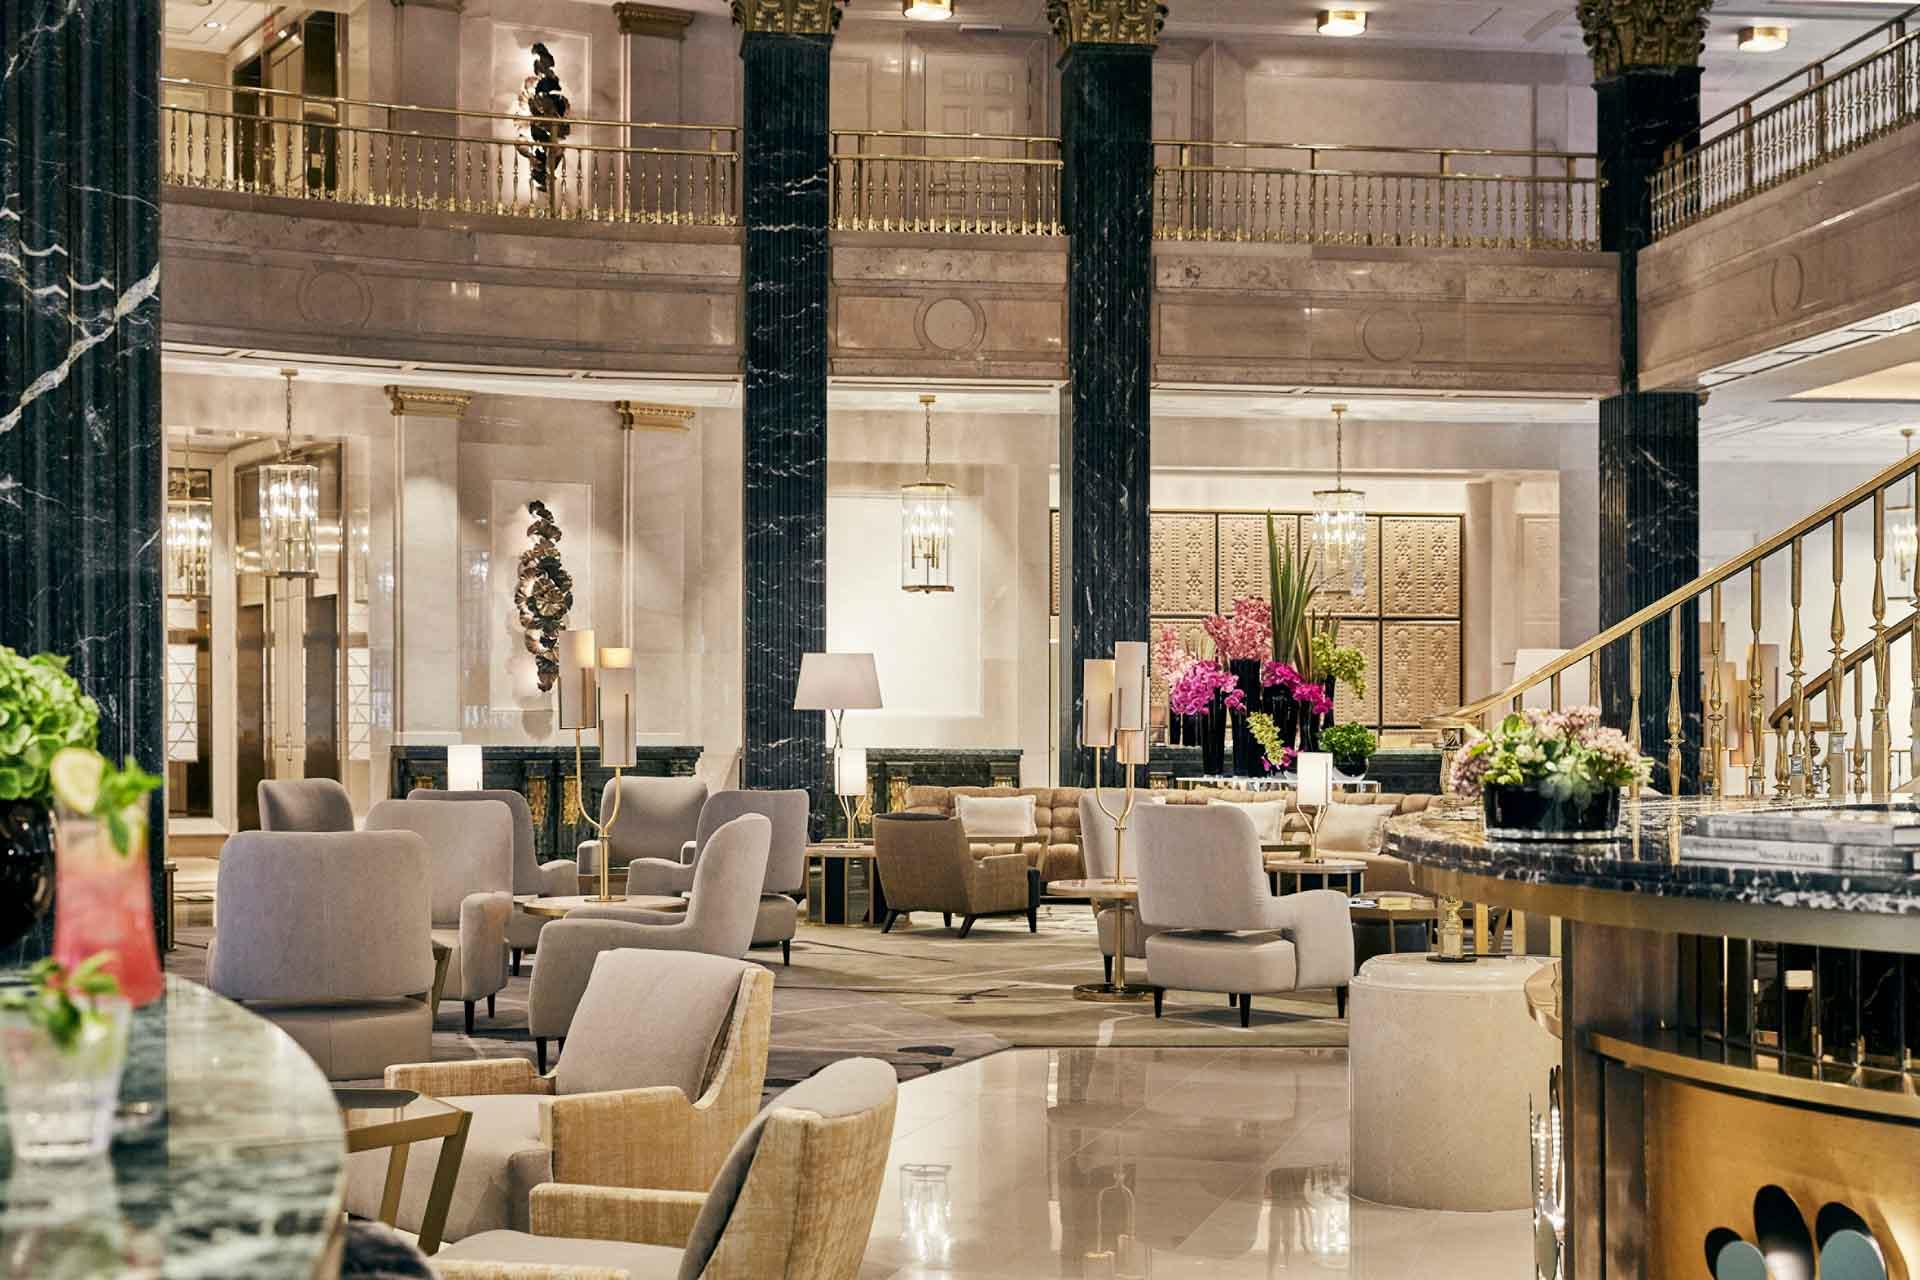 Le lobby du Four Seasons Hotel Madrid © DR